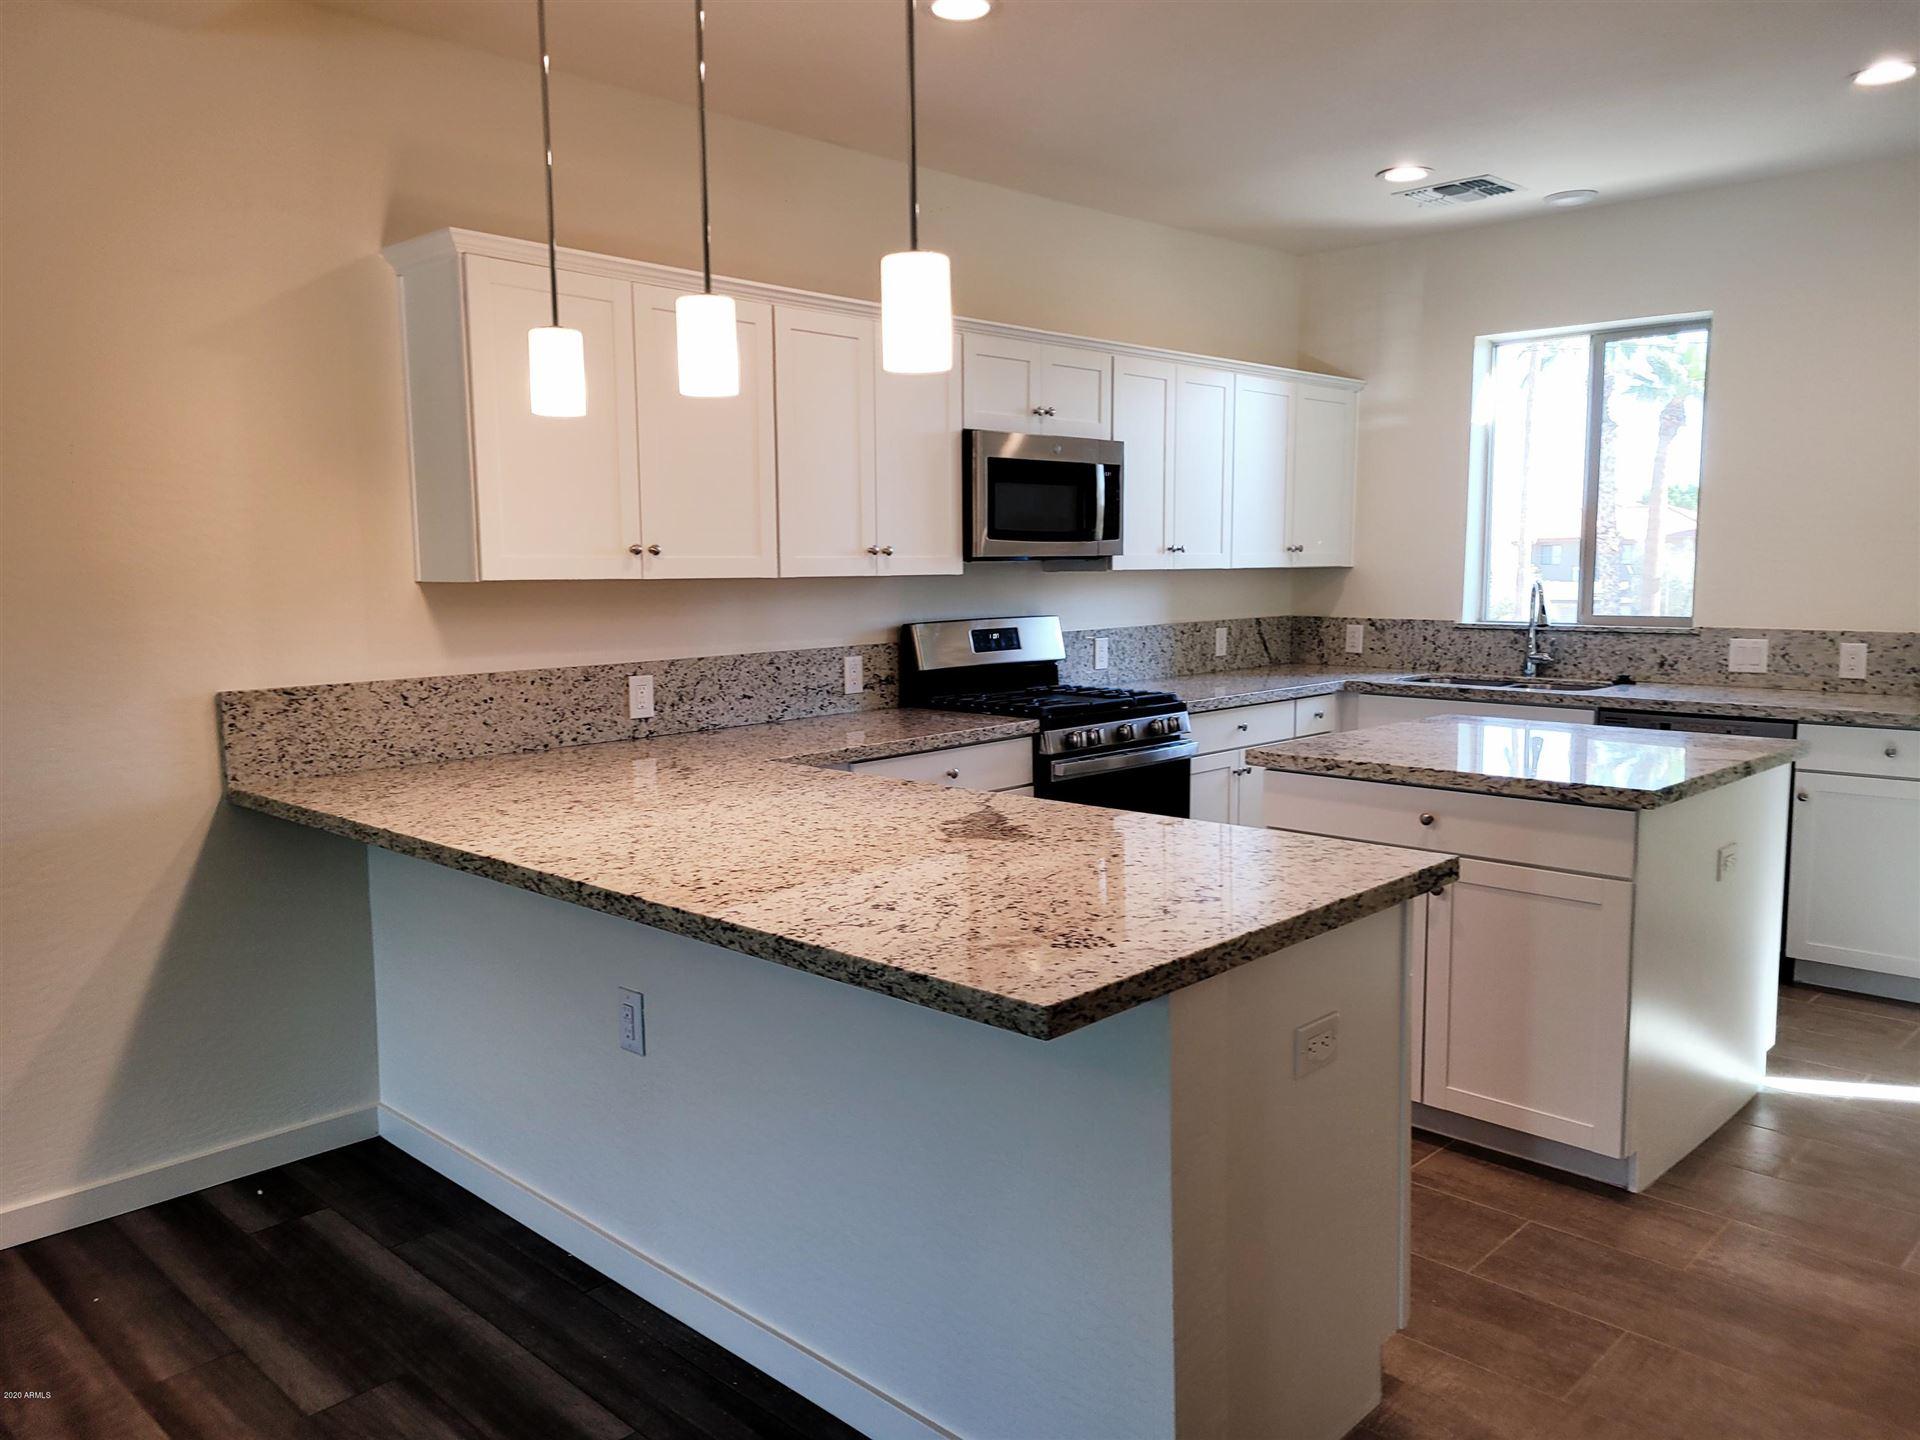 7842 N 20TH Glen, Phoenix, AZ 85021 - MLS#: 6137368